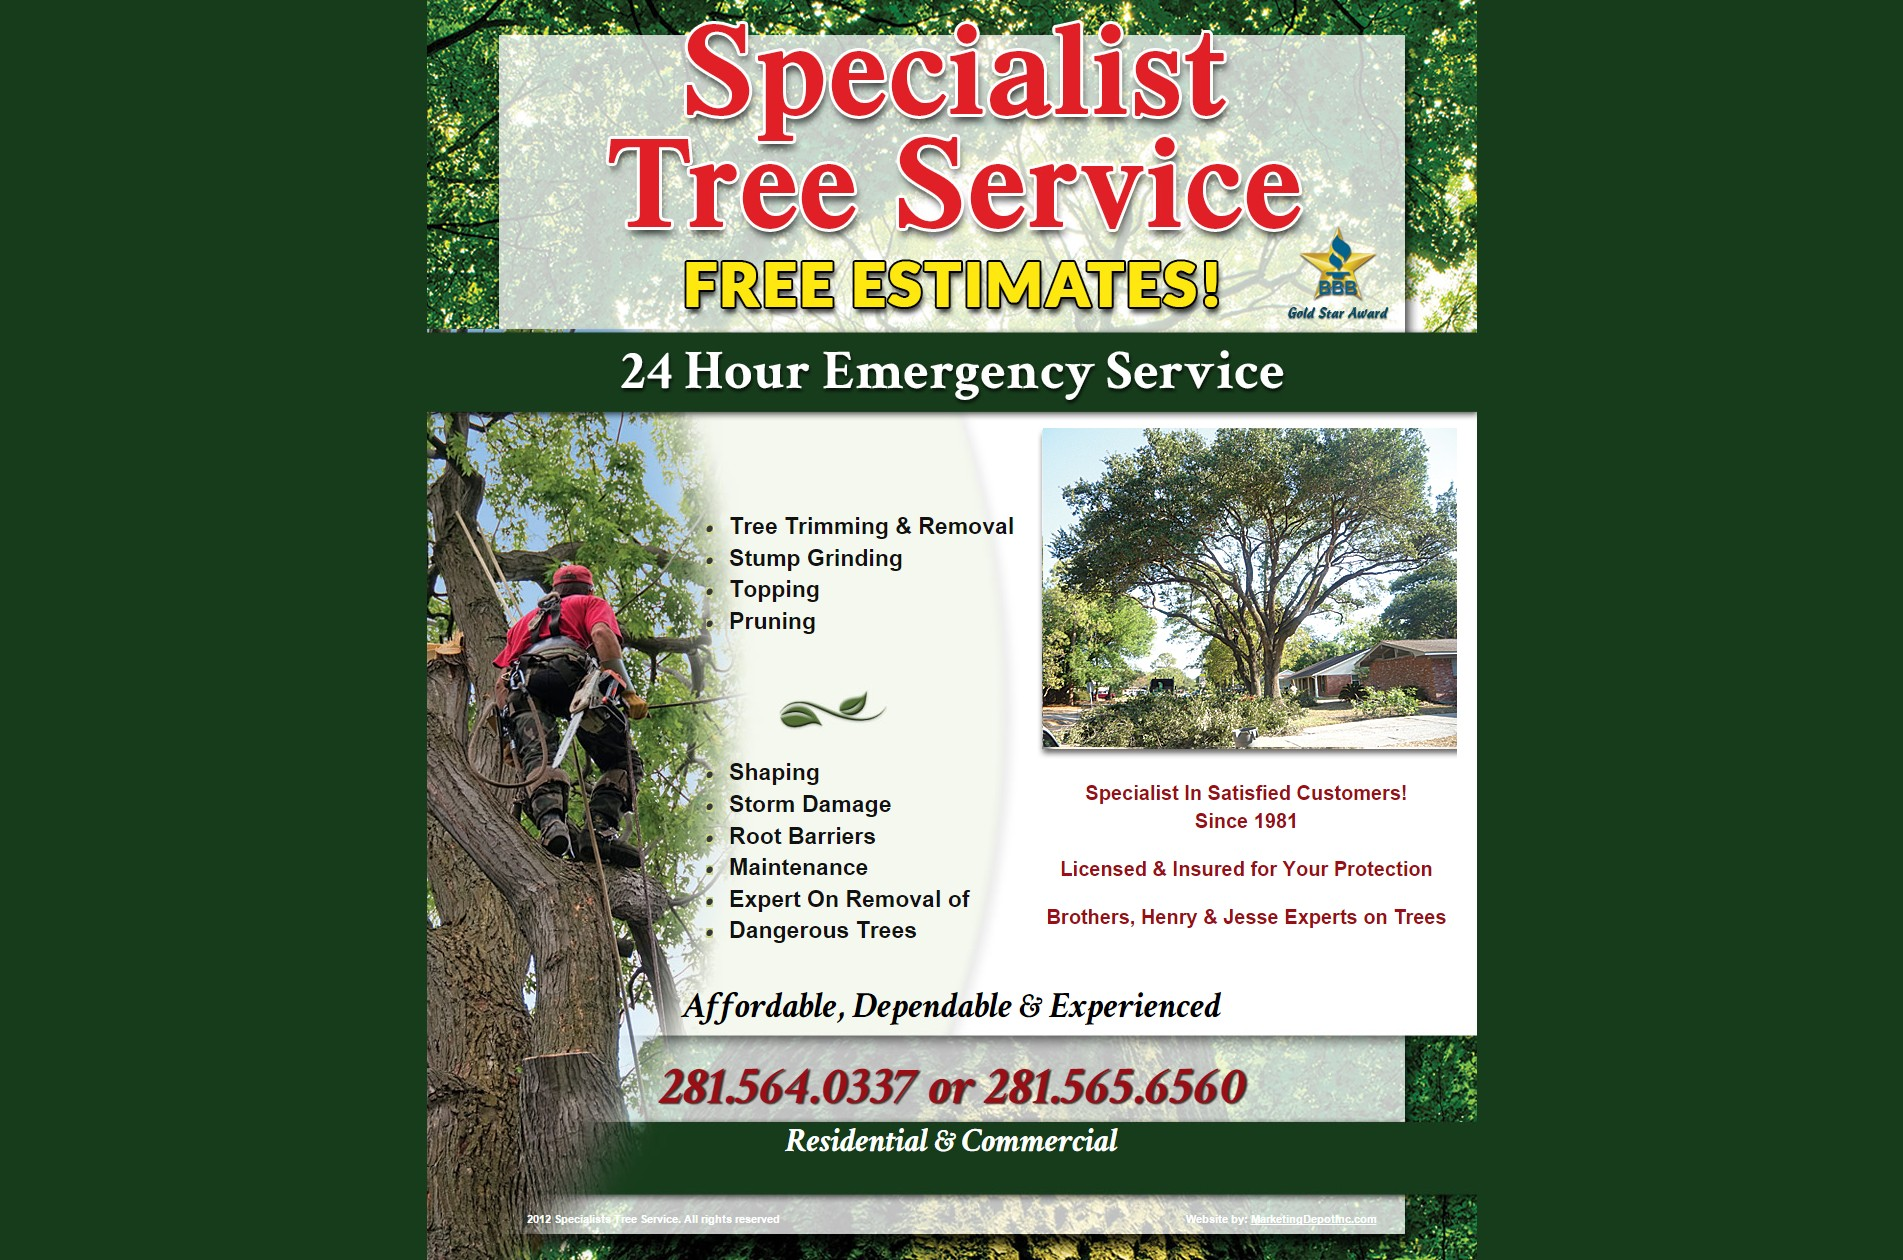 Specialist Tree Service